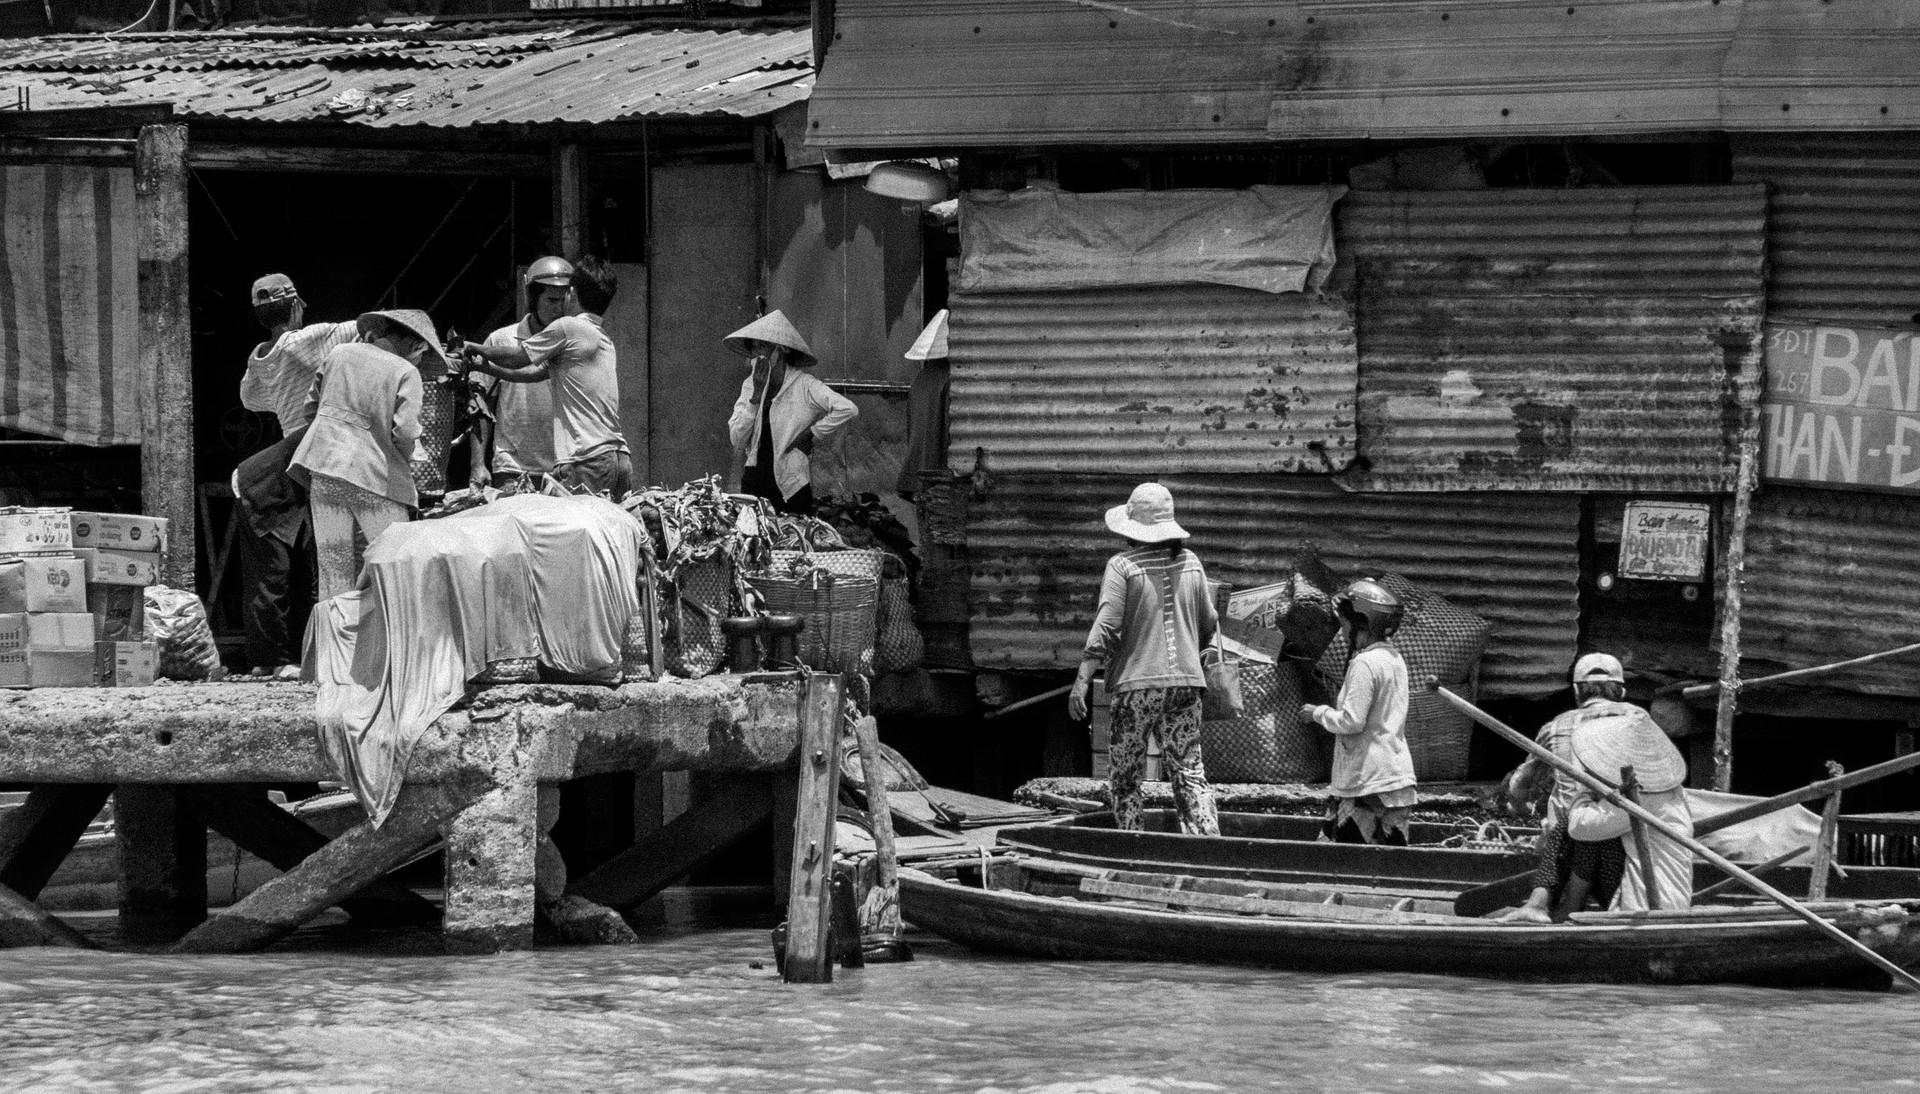 Floated Market